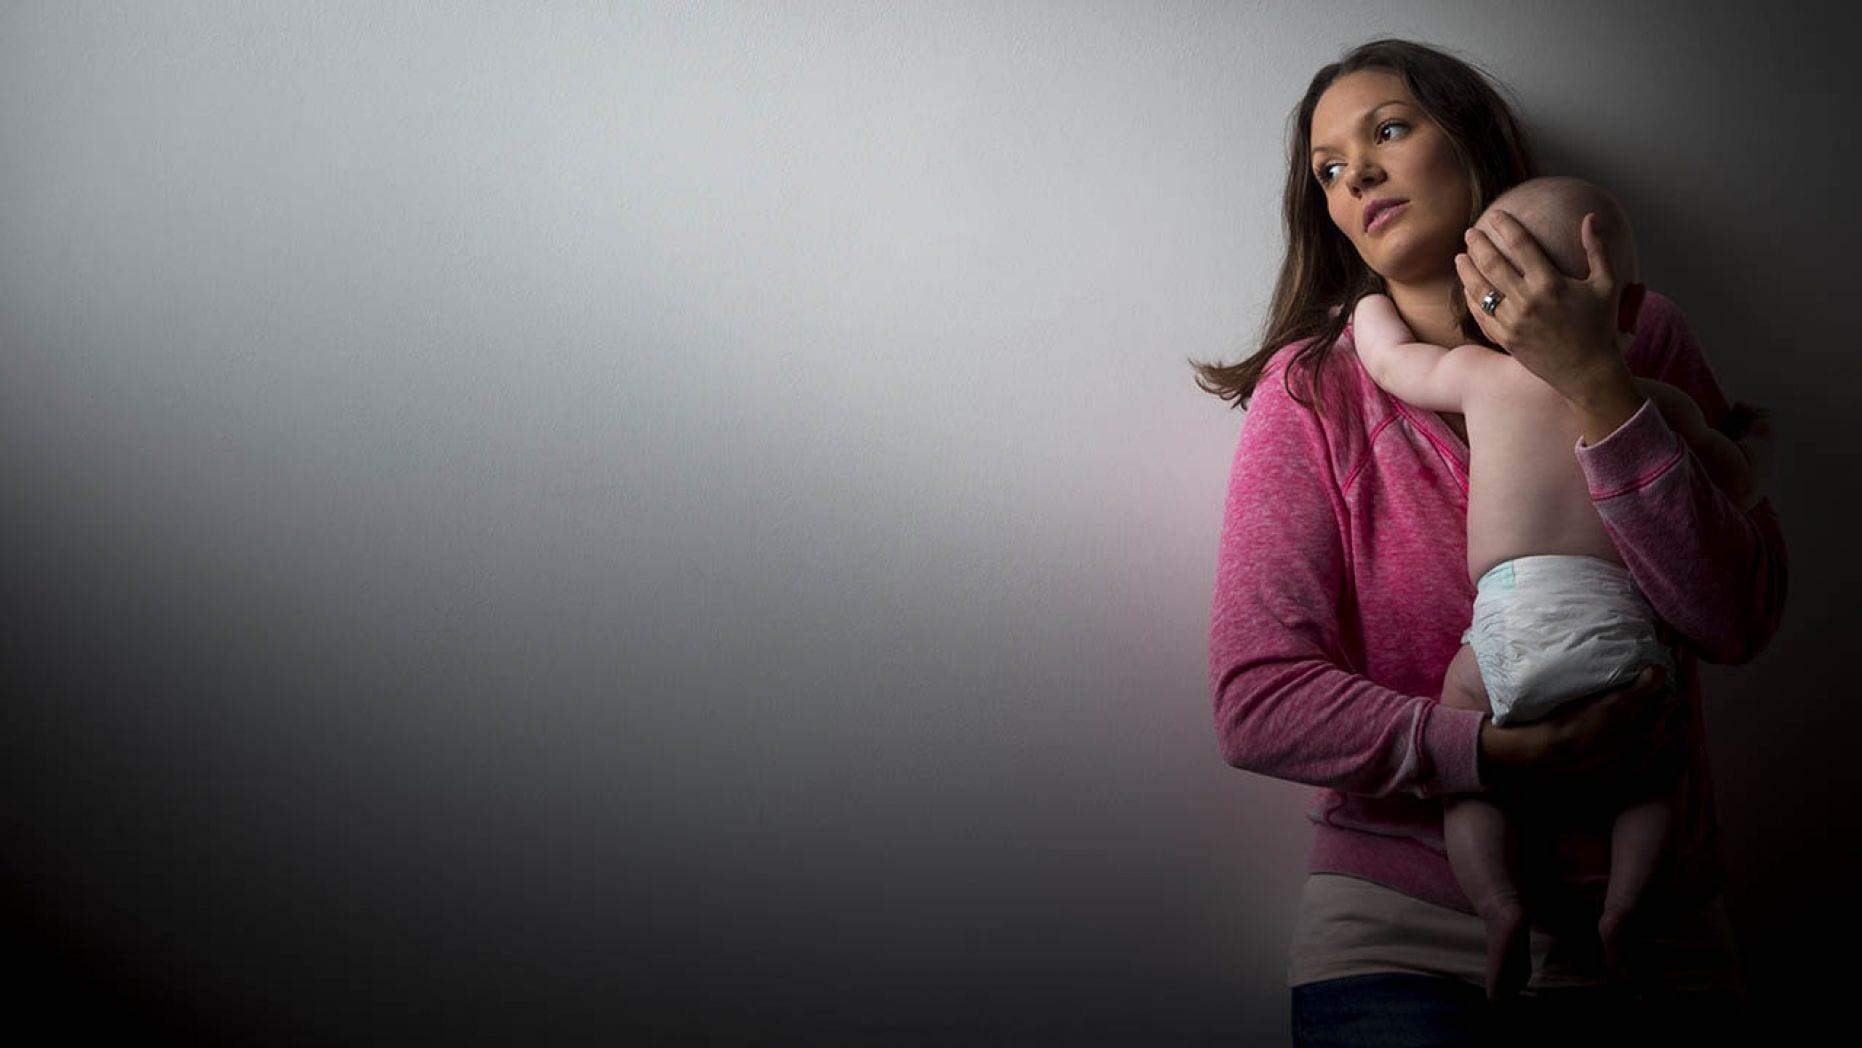 Postpartum Depression is real